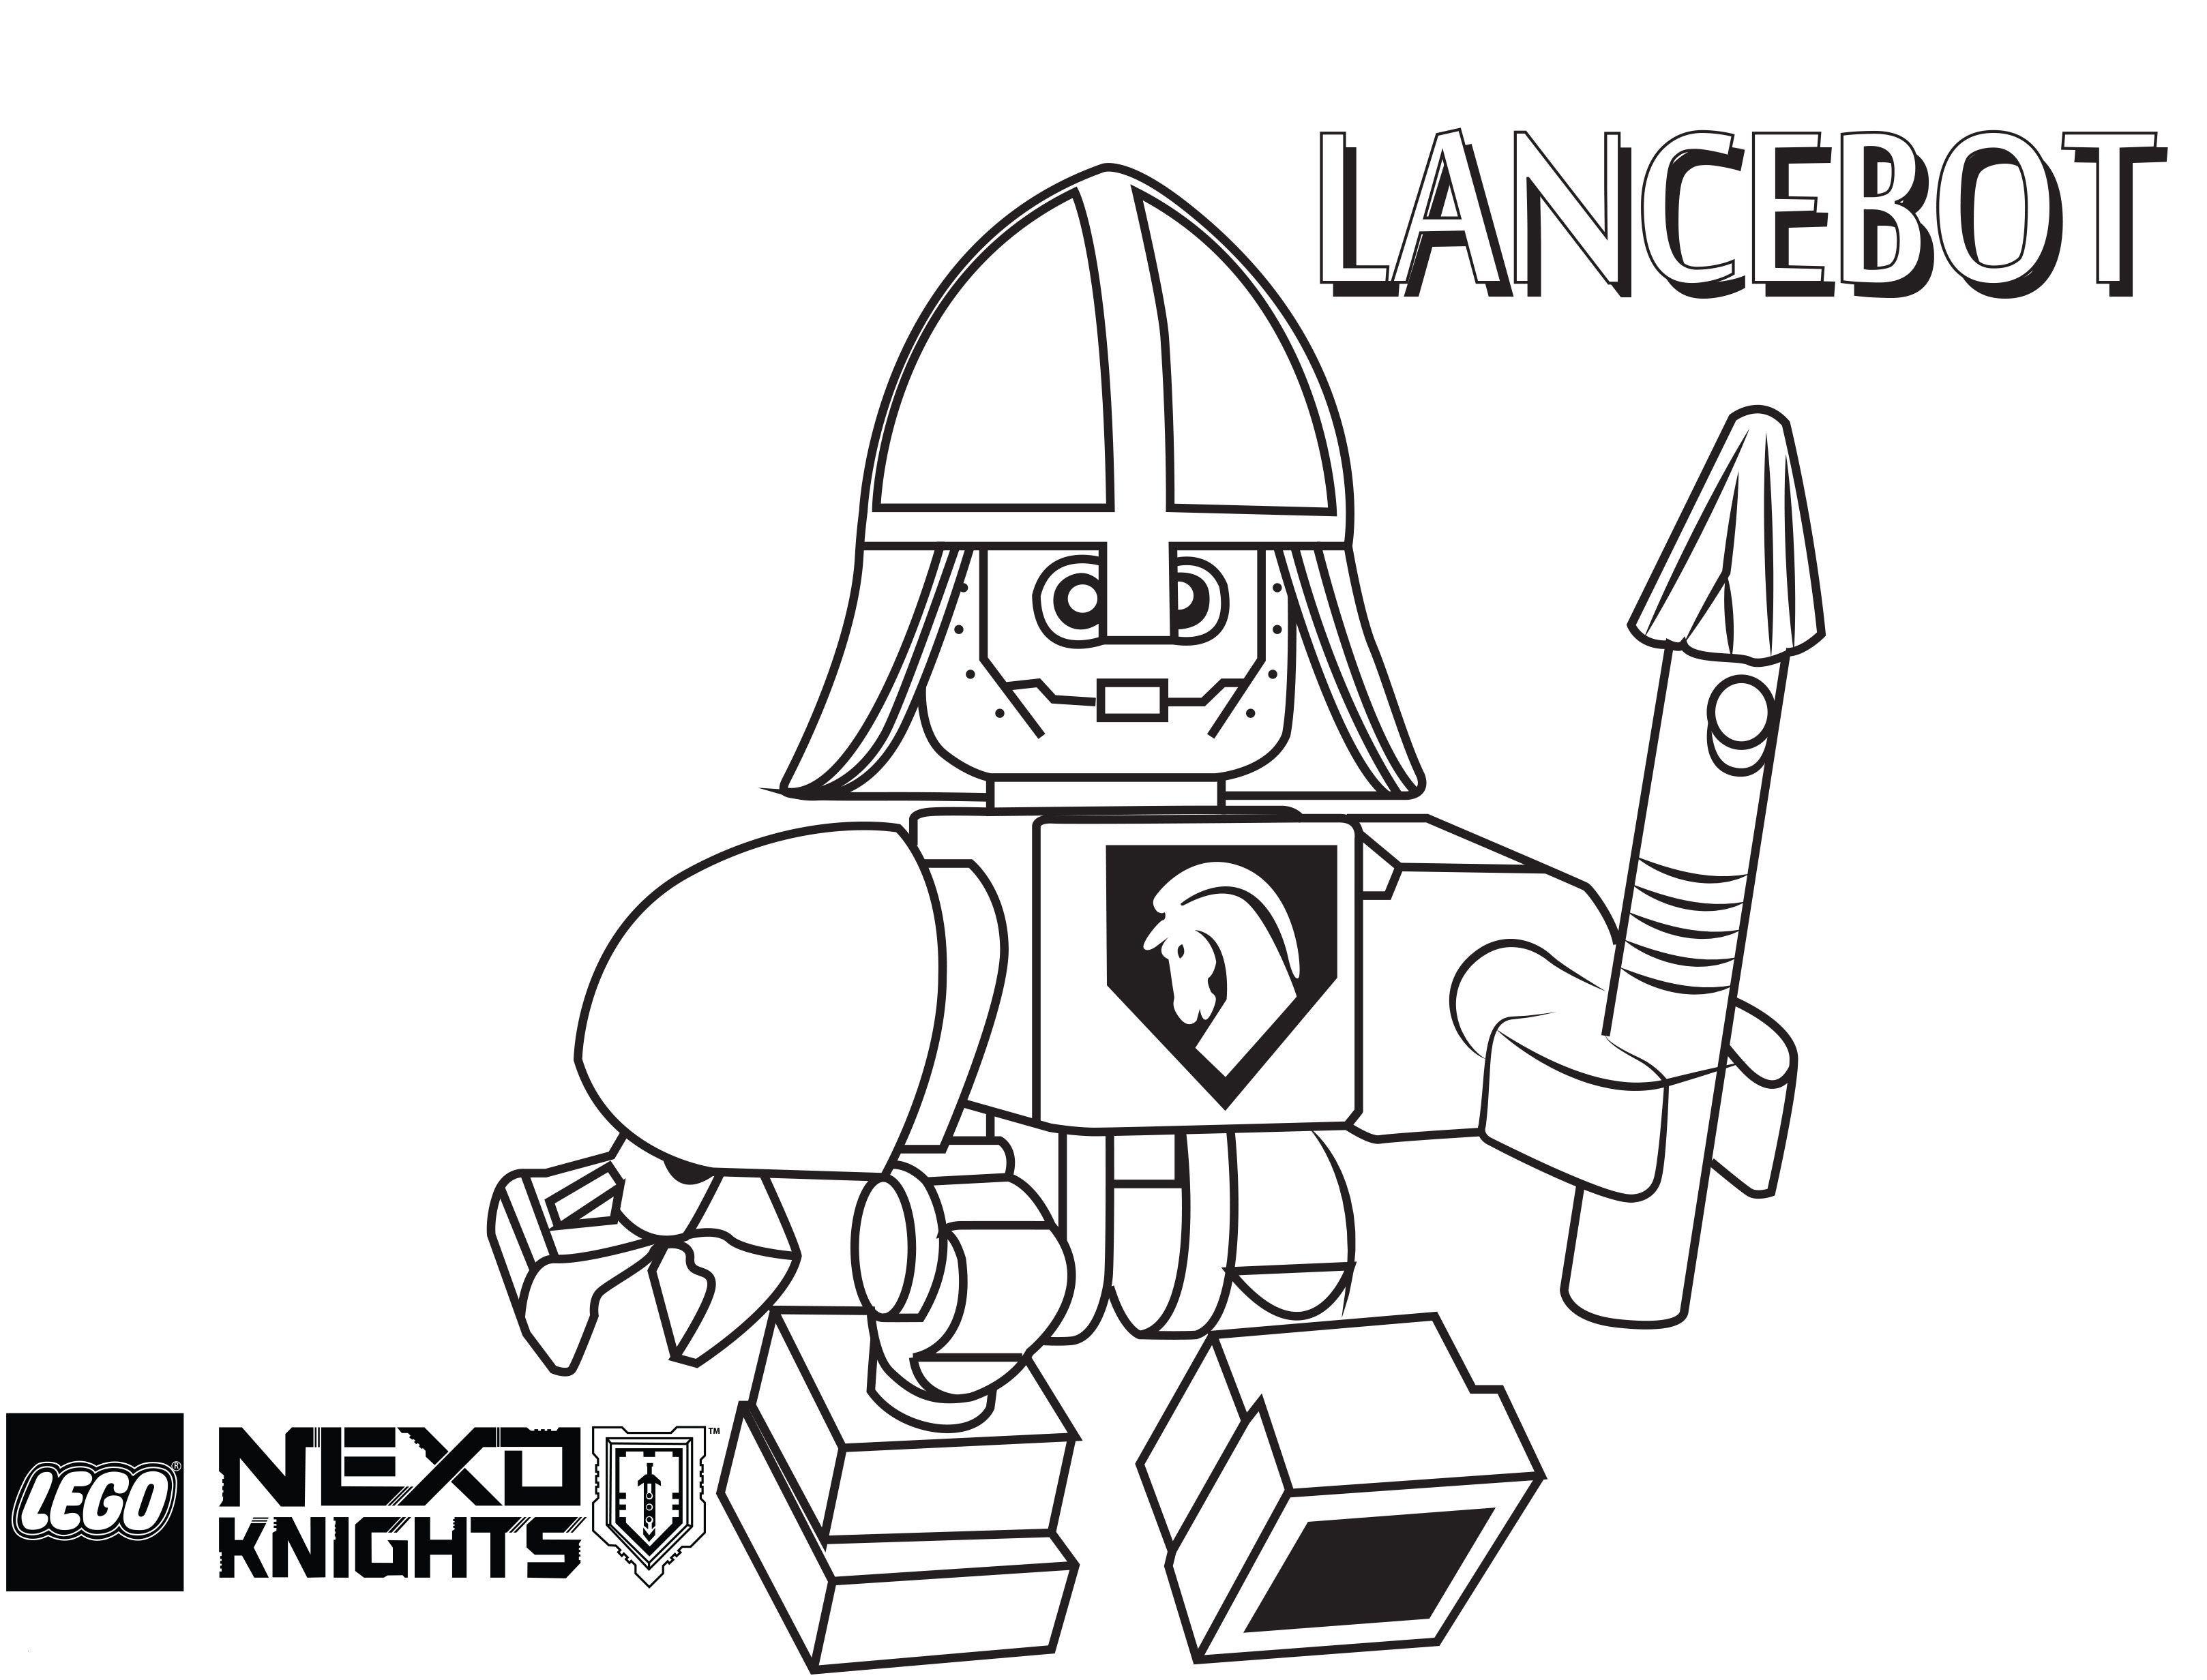 Ausmalbilder Lego Batman Frisch Lego Nexo Knights Coloring Pages Free Printable Lego Nexo Knights Sammlung